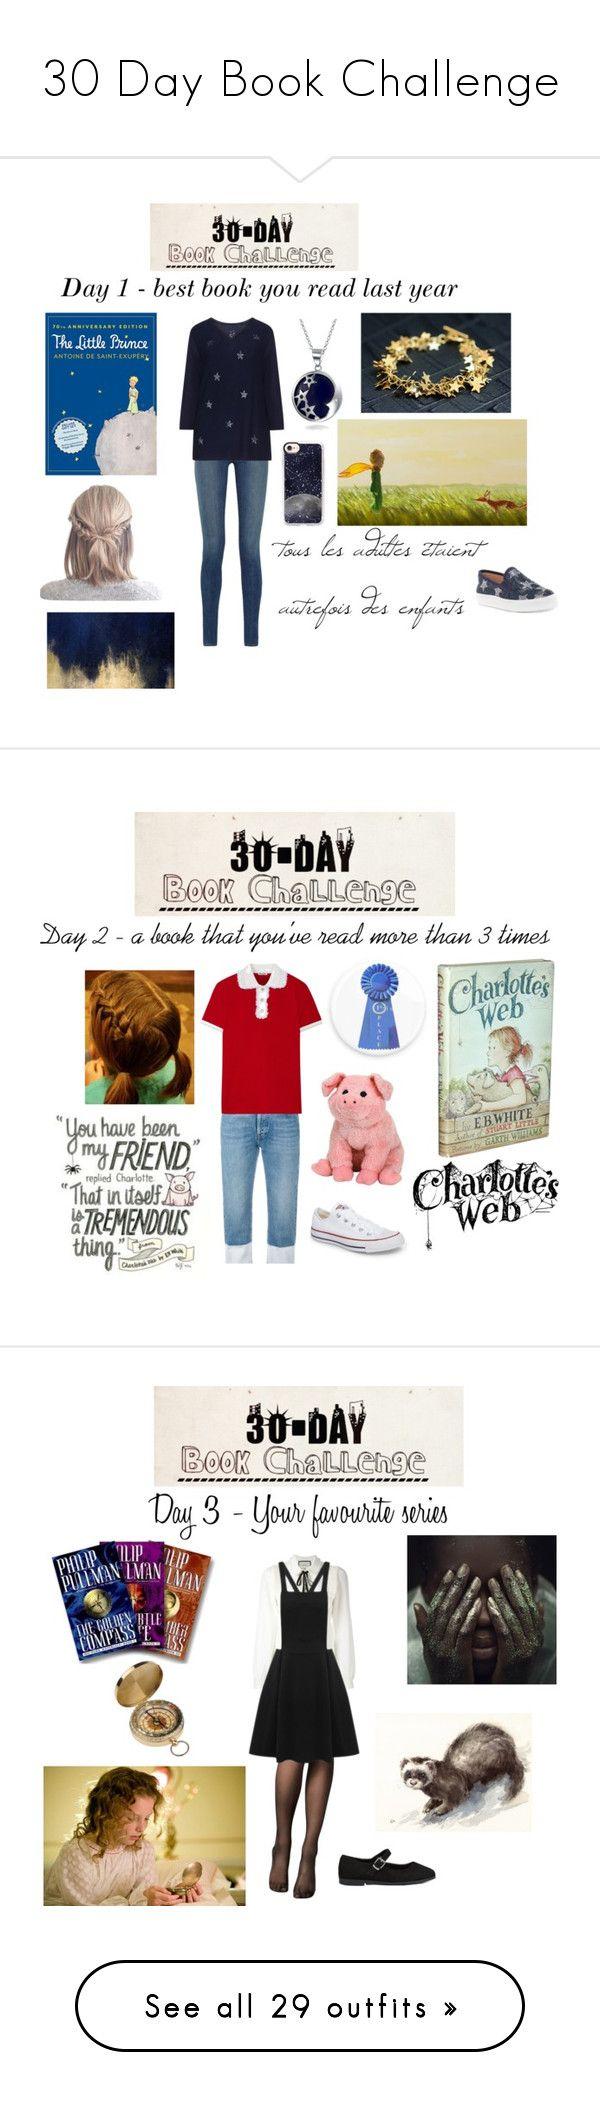 Best 25+ Houghton mifflin harcourt ideas on Pinterest | Responsive ...